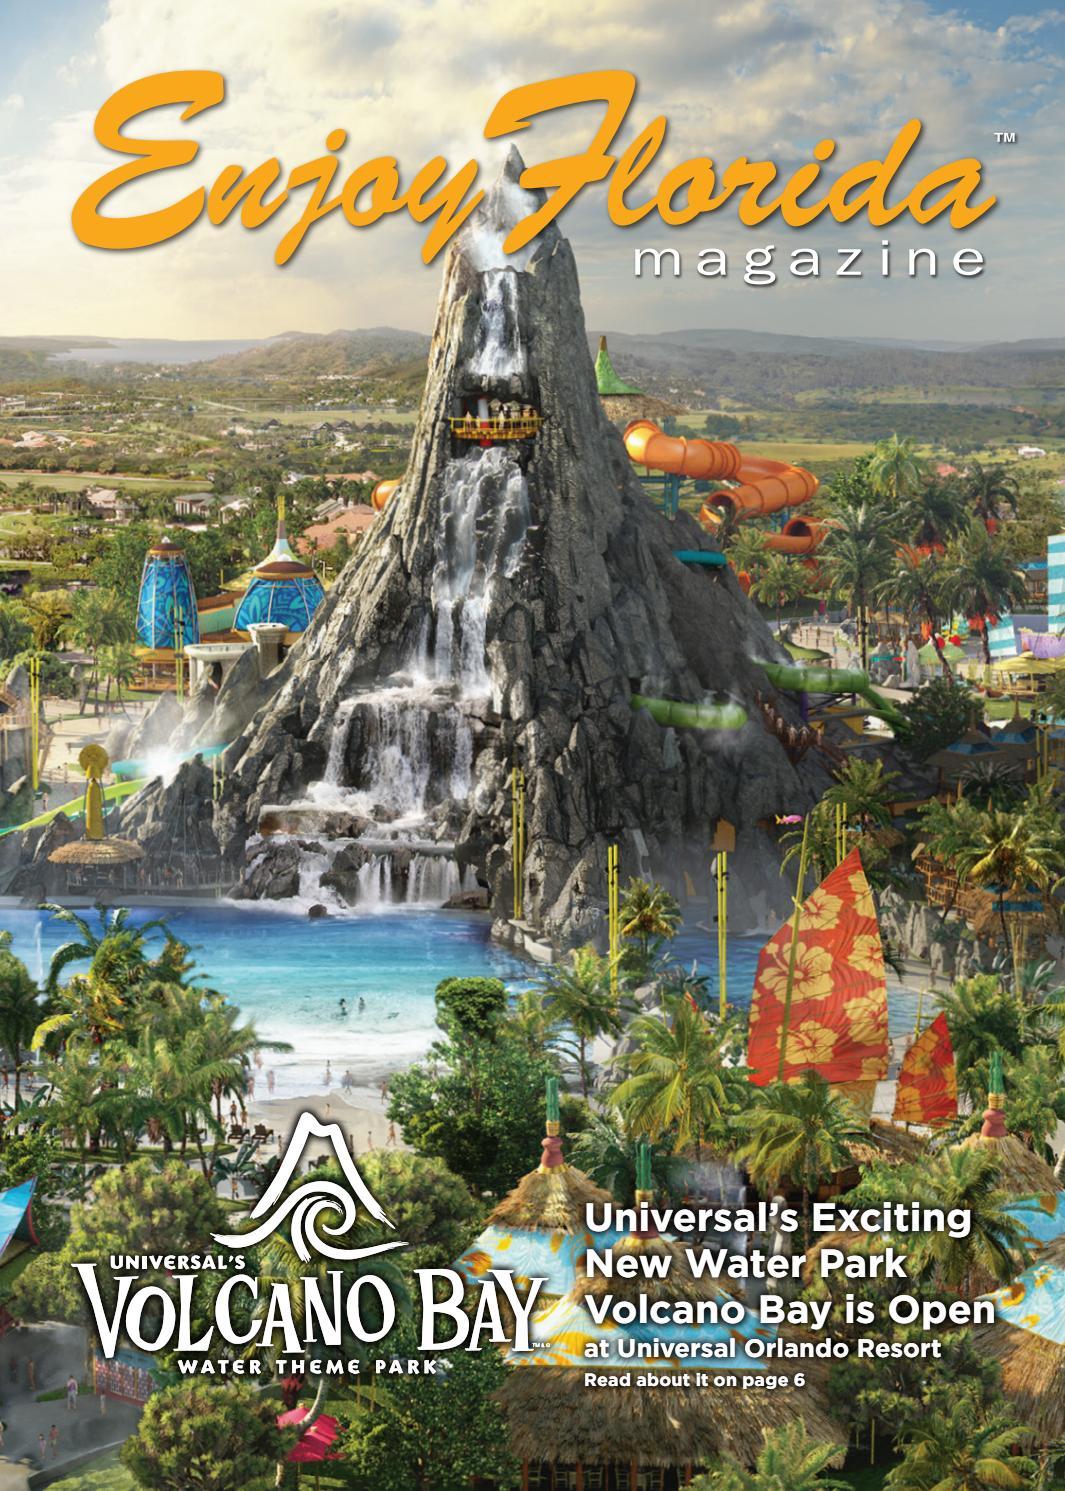 VOLCANO BAY WATER THEME PARK ORLANDO FLORIDA brochure NEW free shipping